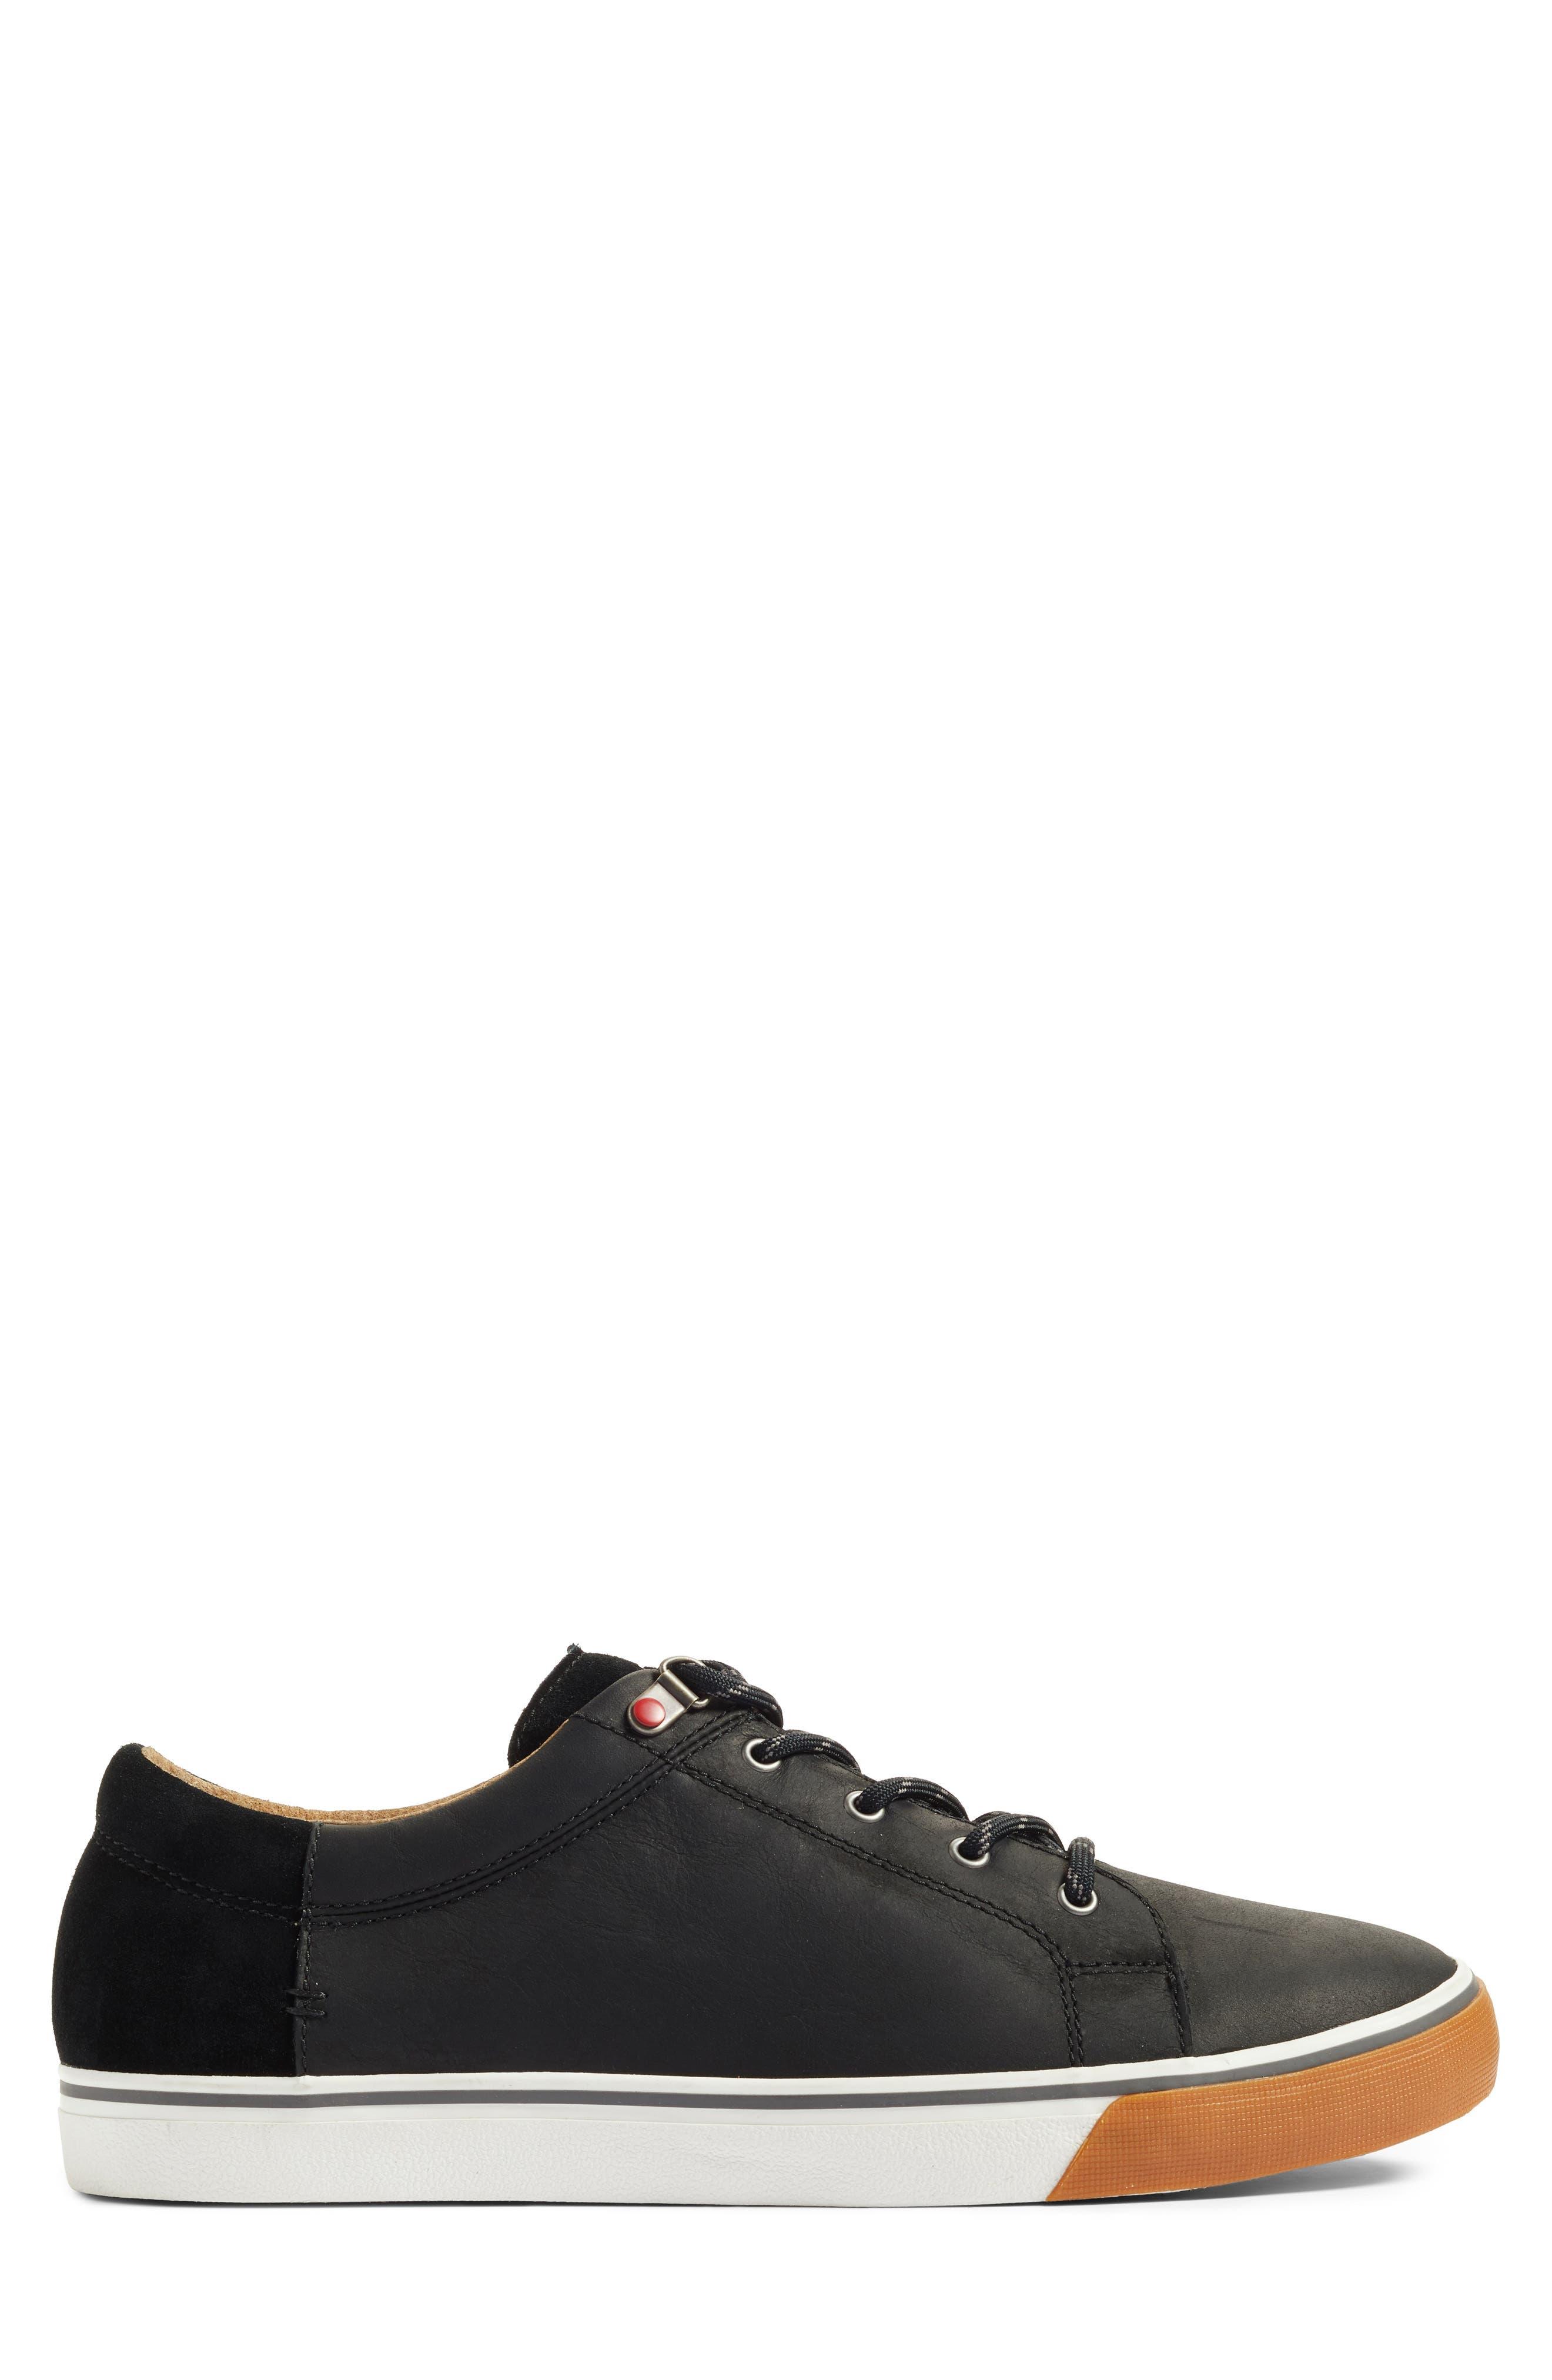 Brock Sneaker,                             Alternate thumbnail 3, color,                             001